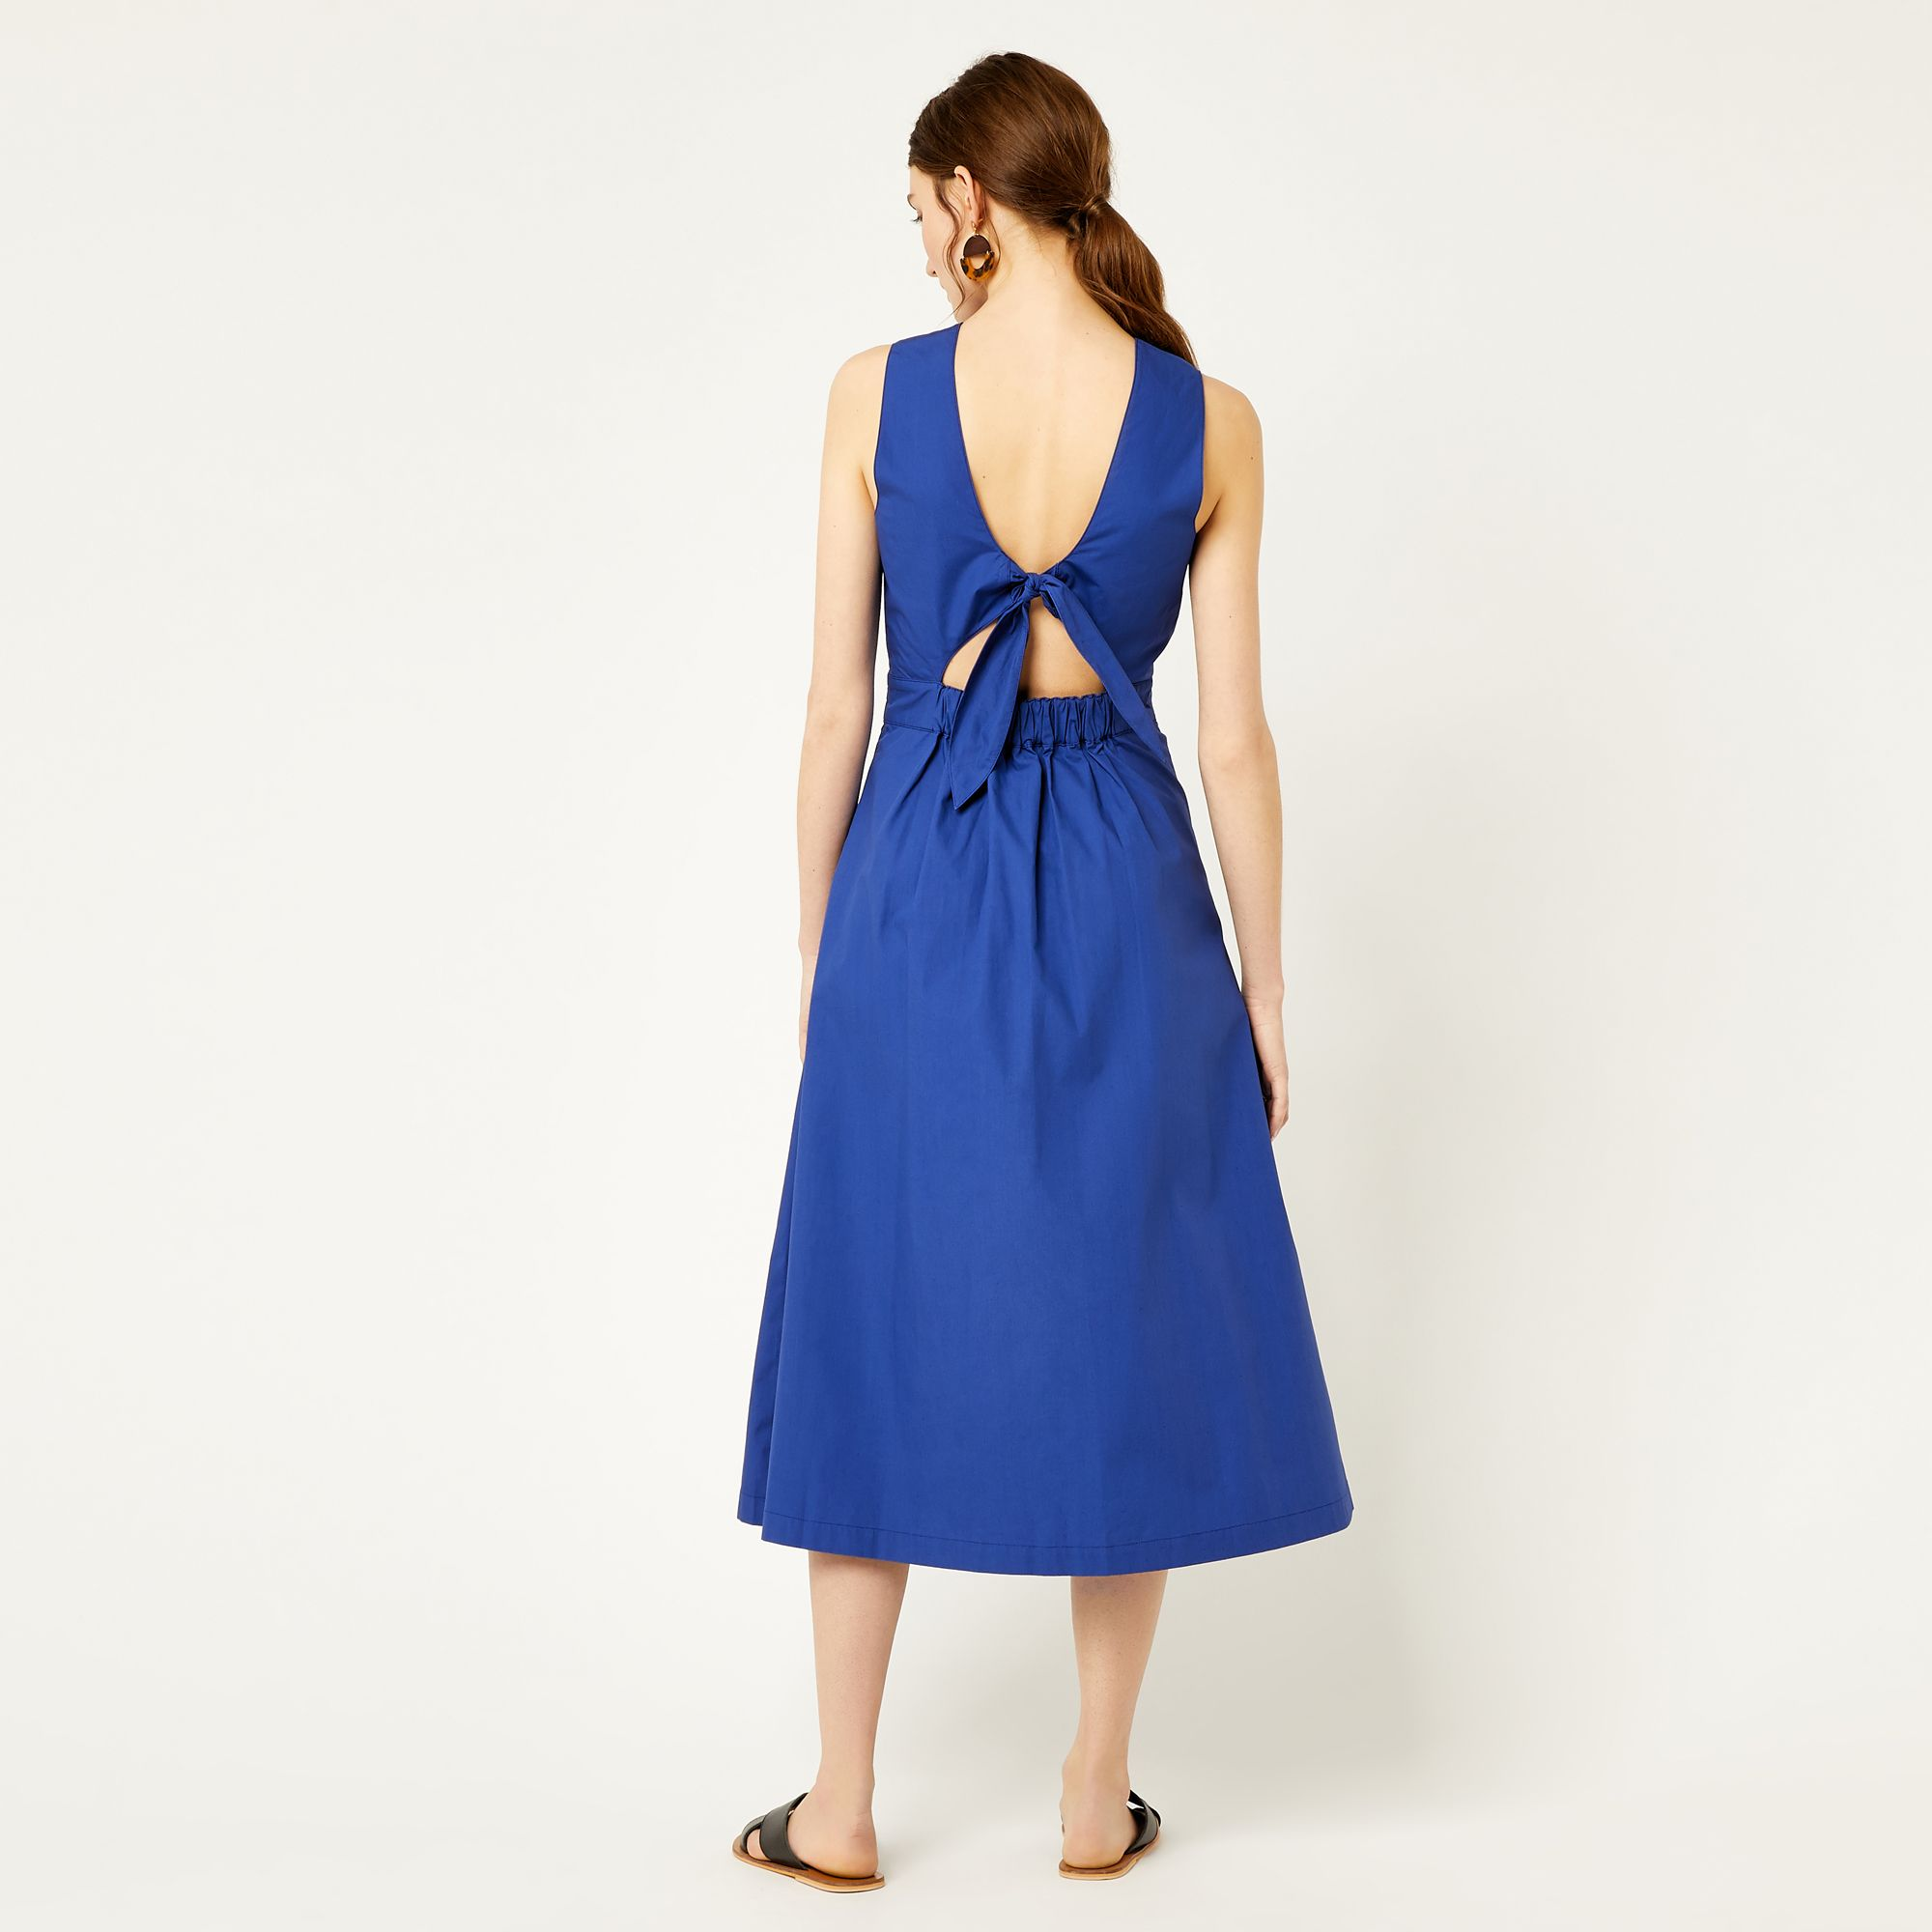 7a4b9d6d39c9 Cotton tie back midi dress   Spring / Summer 2018   Dresses, Midi ...